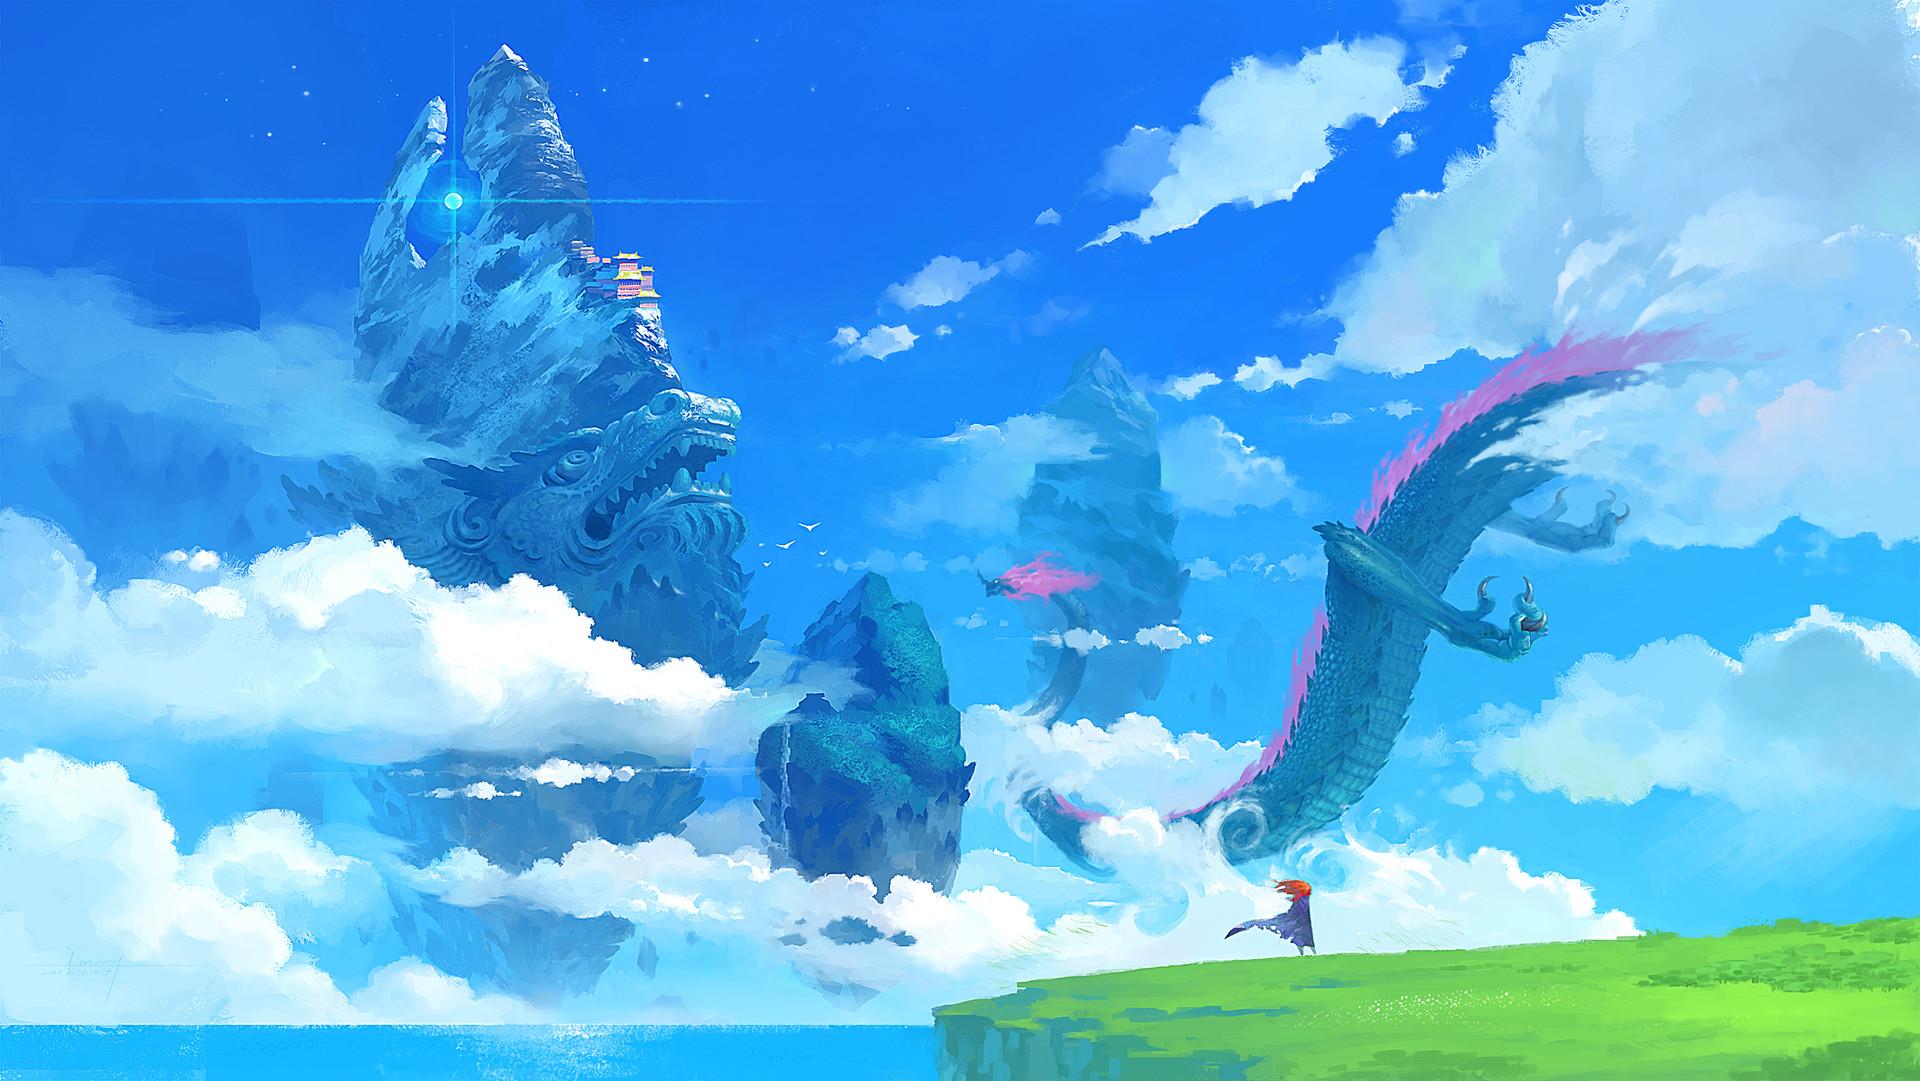 General 1920x1081 Yiming Nie digital art fantasy art clouds dragon Asian architecture